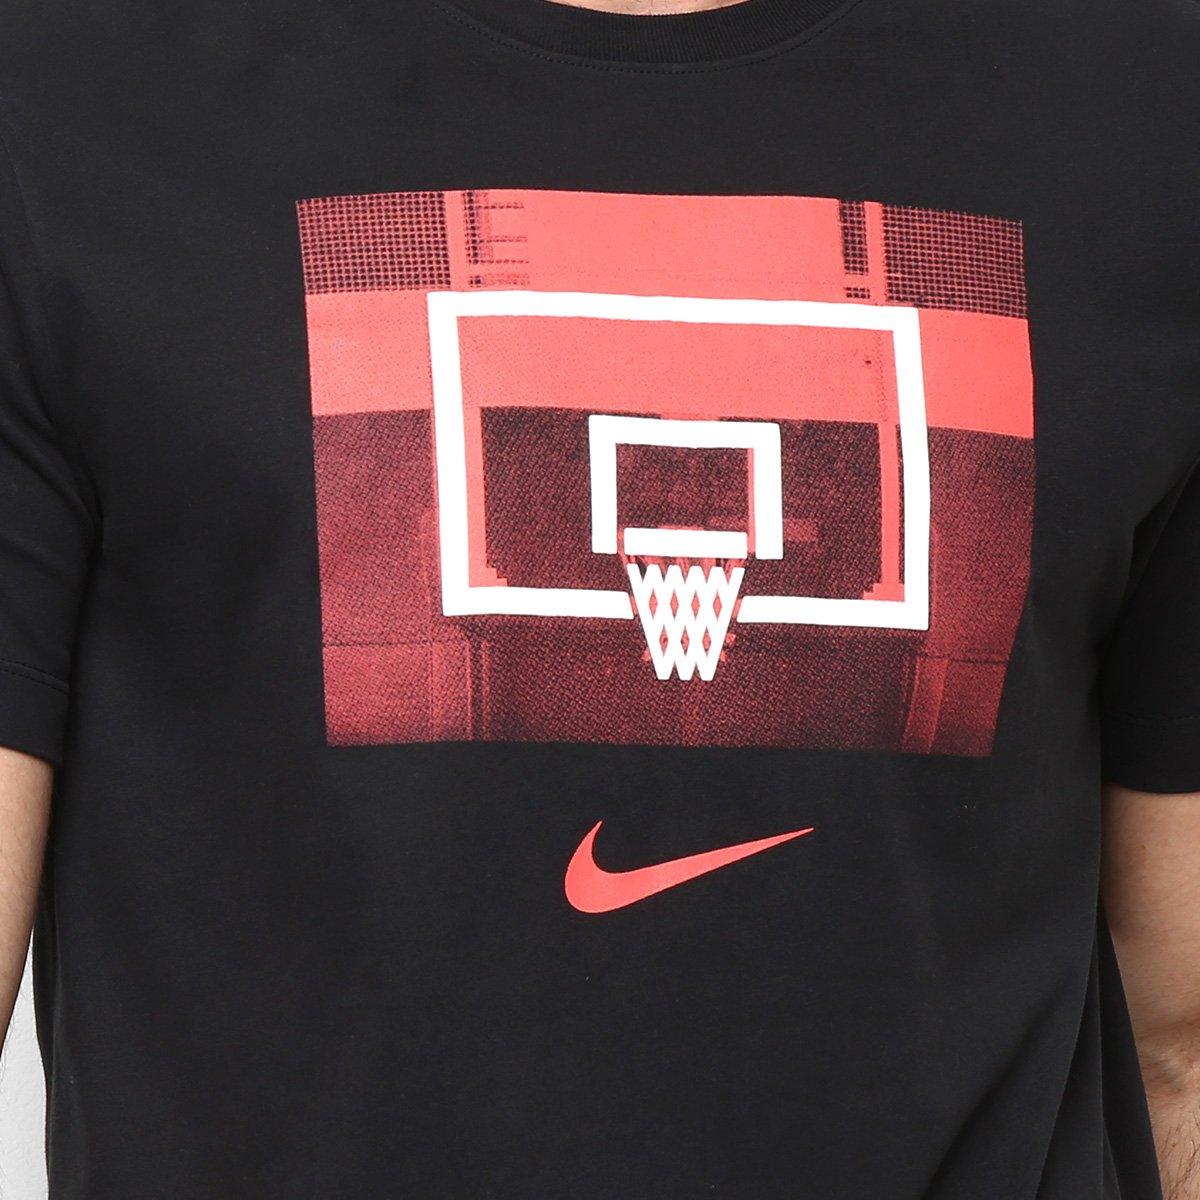 cdae01c3d7 Camiseta Nike Dri-Fit Backboard Masculina - Tam: P - Shopping TudoAzul